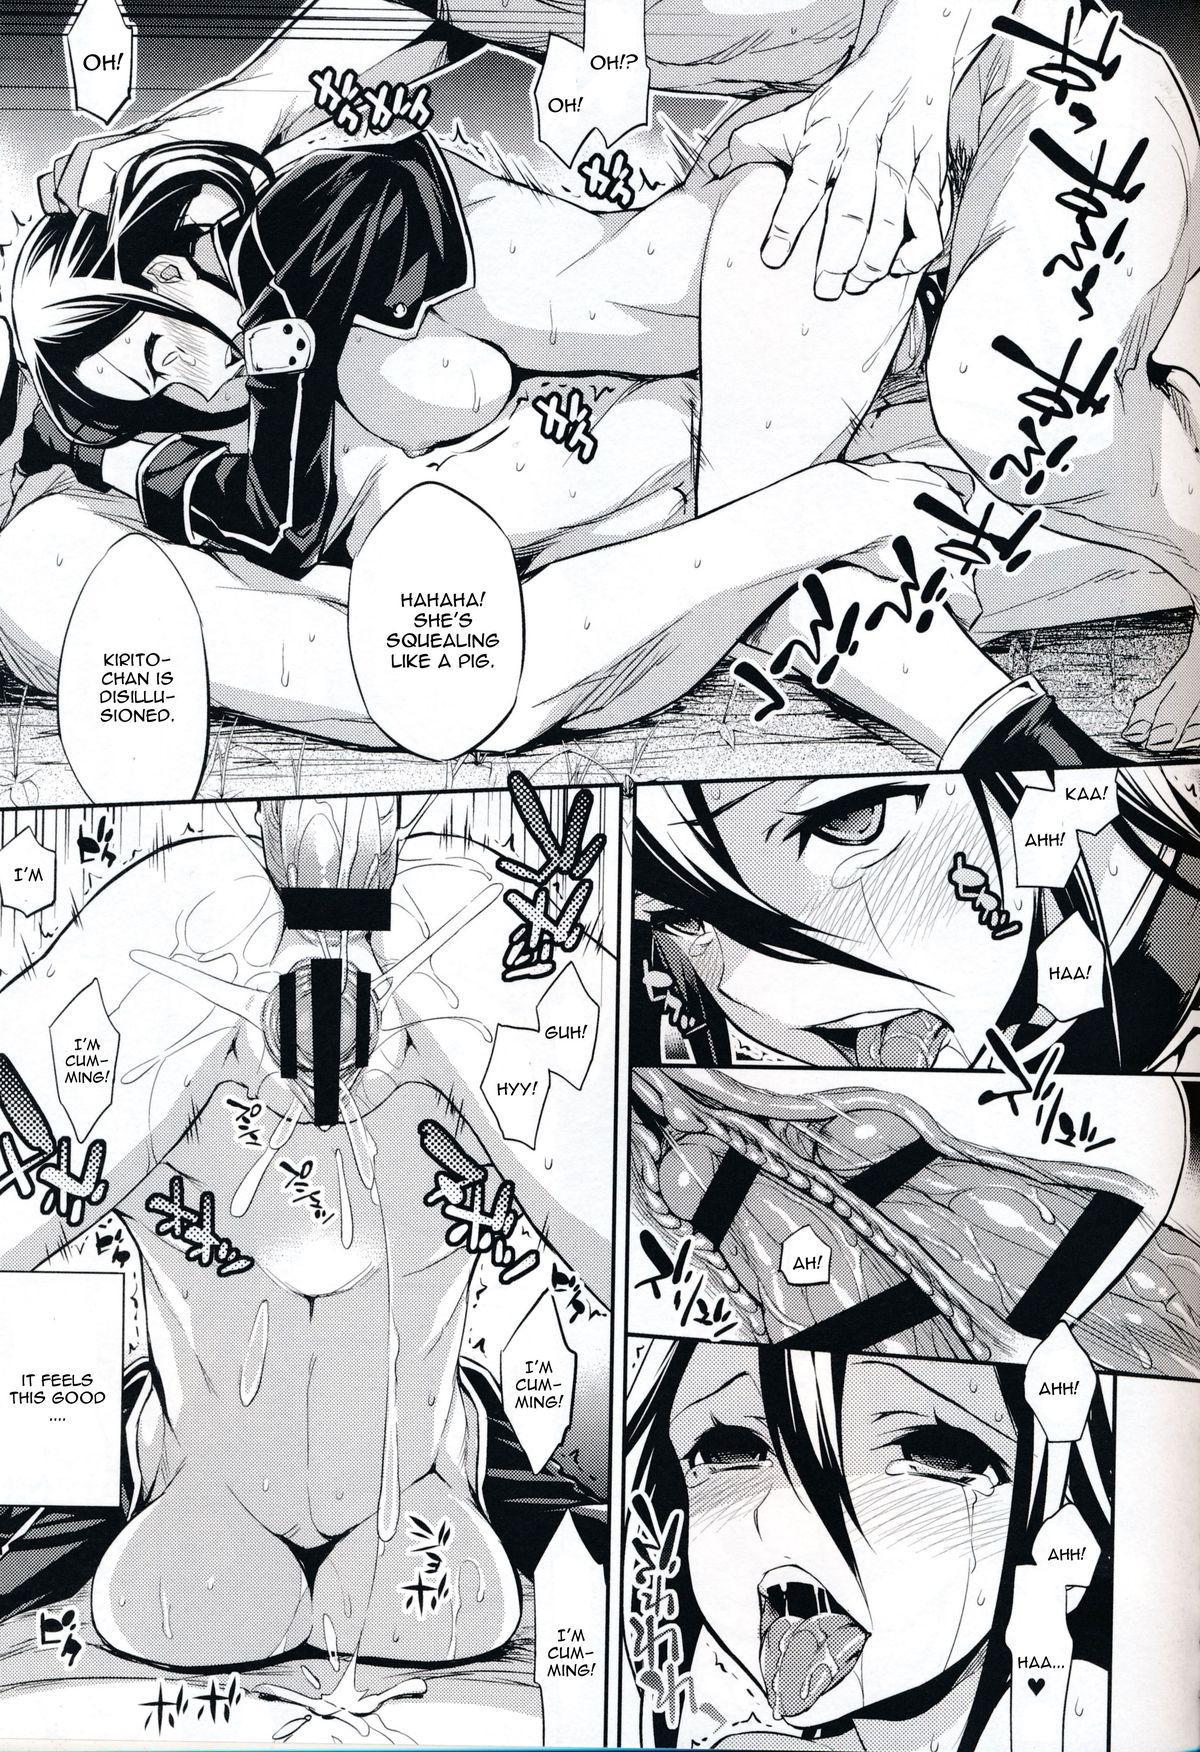 (SC65) [Crazy9 (Ichitaka)] C9-14 TS~Kirito-chan no Avatar wa Random Nyotai (Sword Art Online) [English] {CGrascal} 13